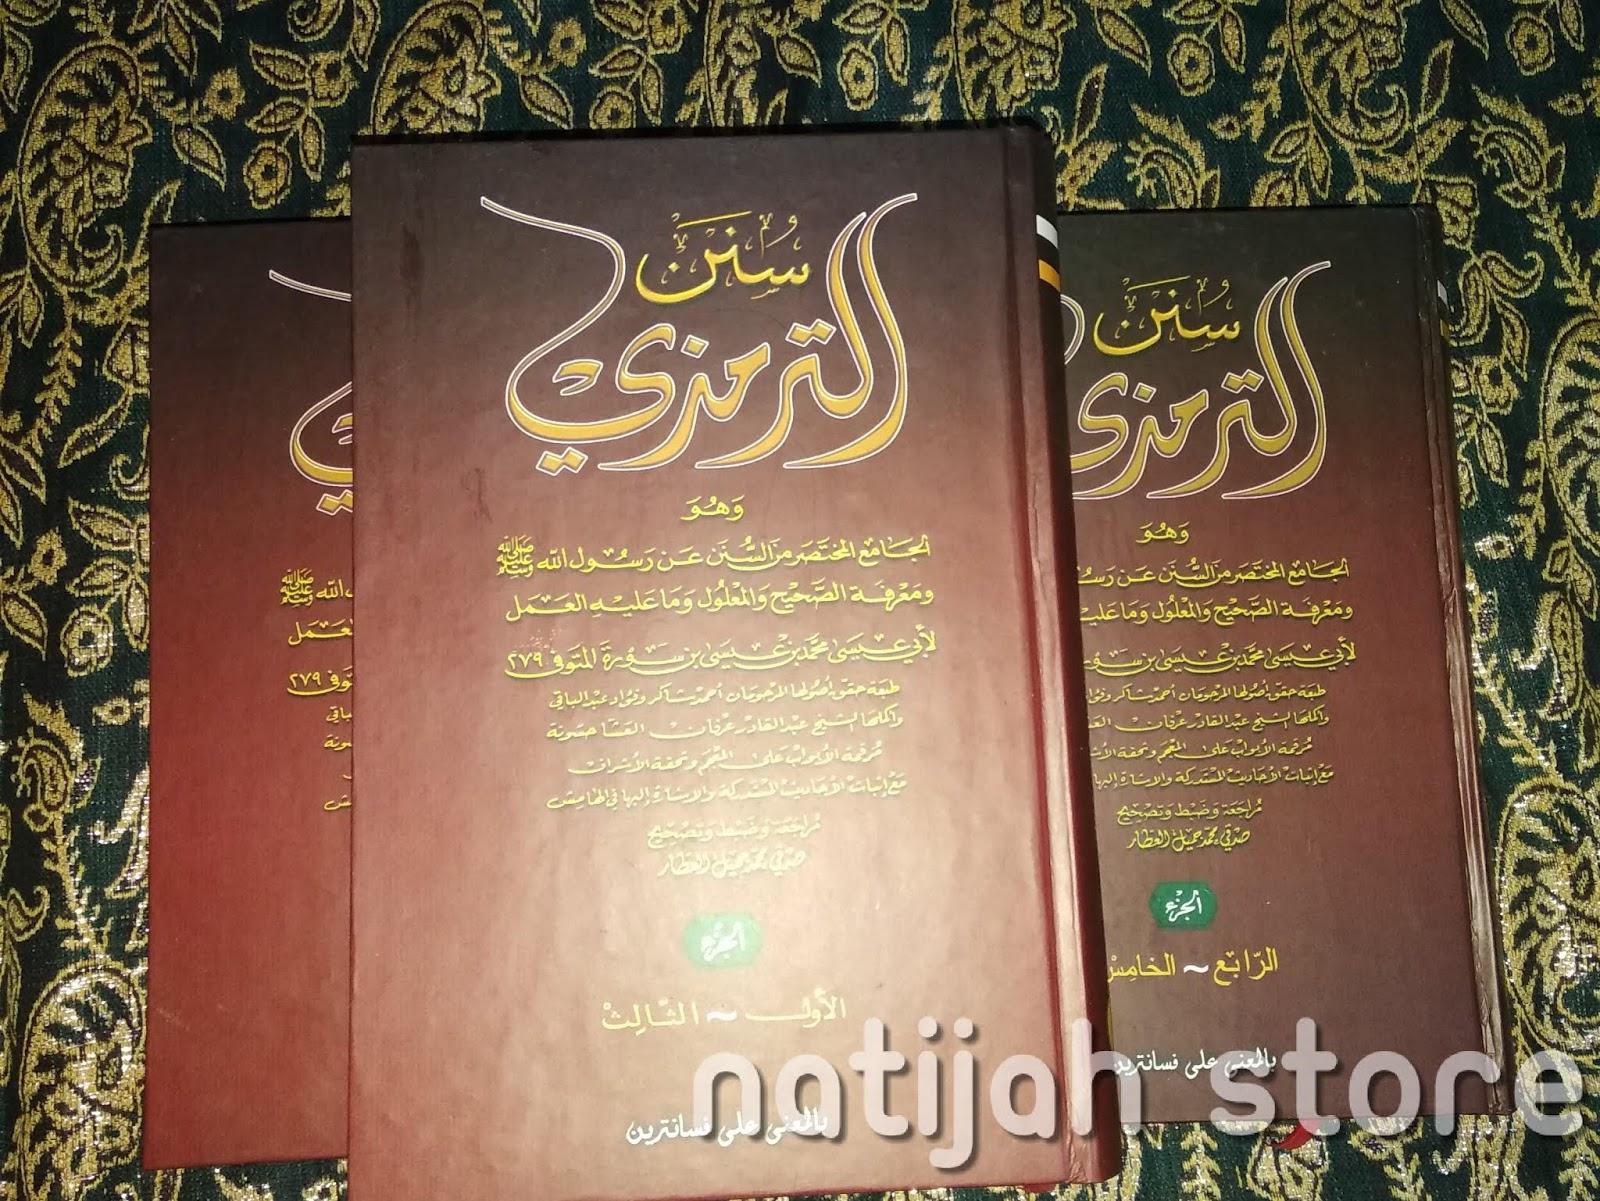 Kitab Hadits Sunan Turmudzi